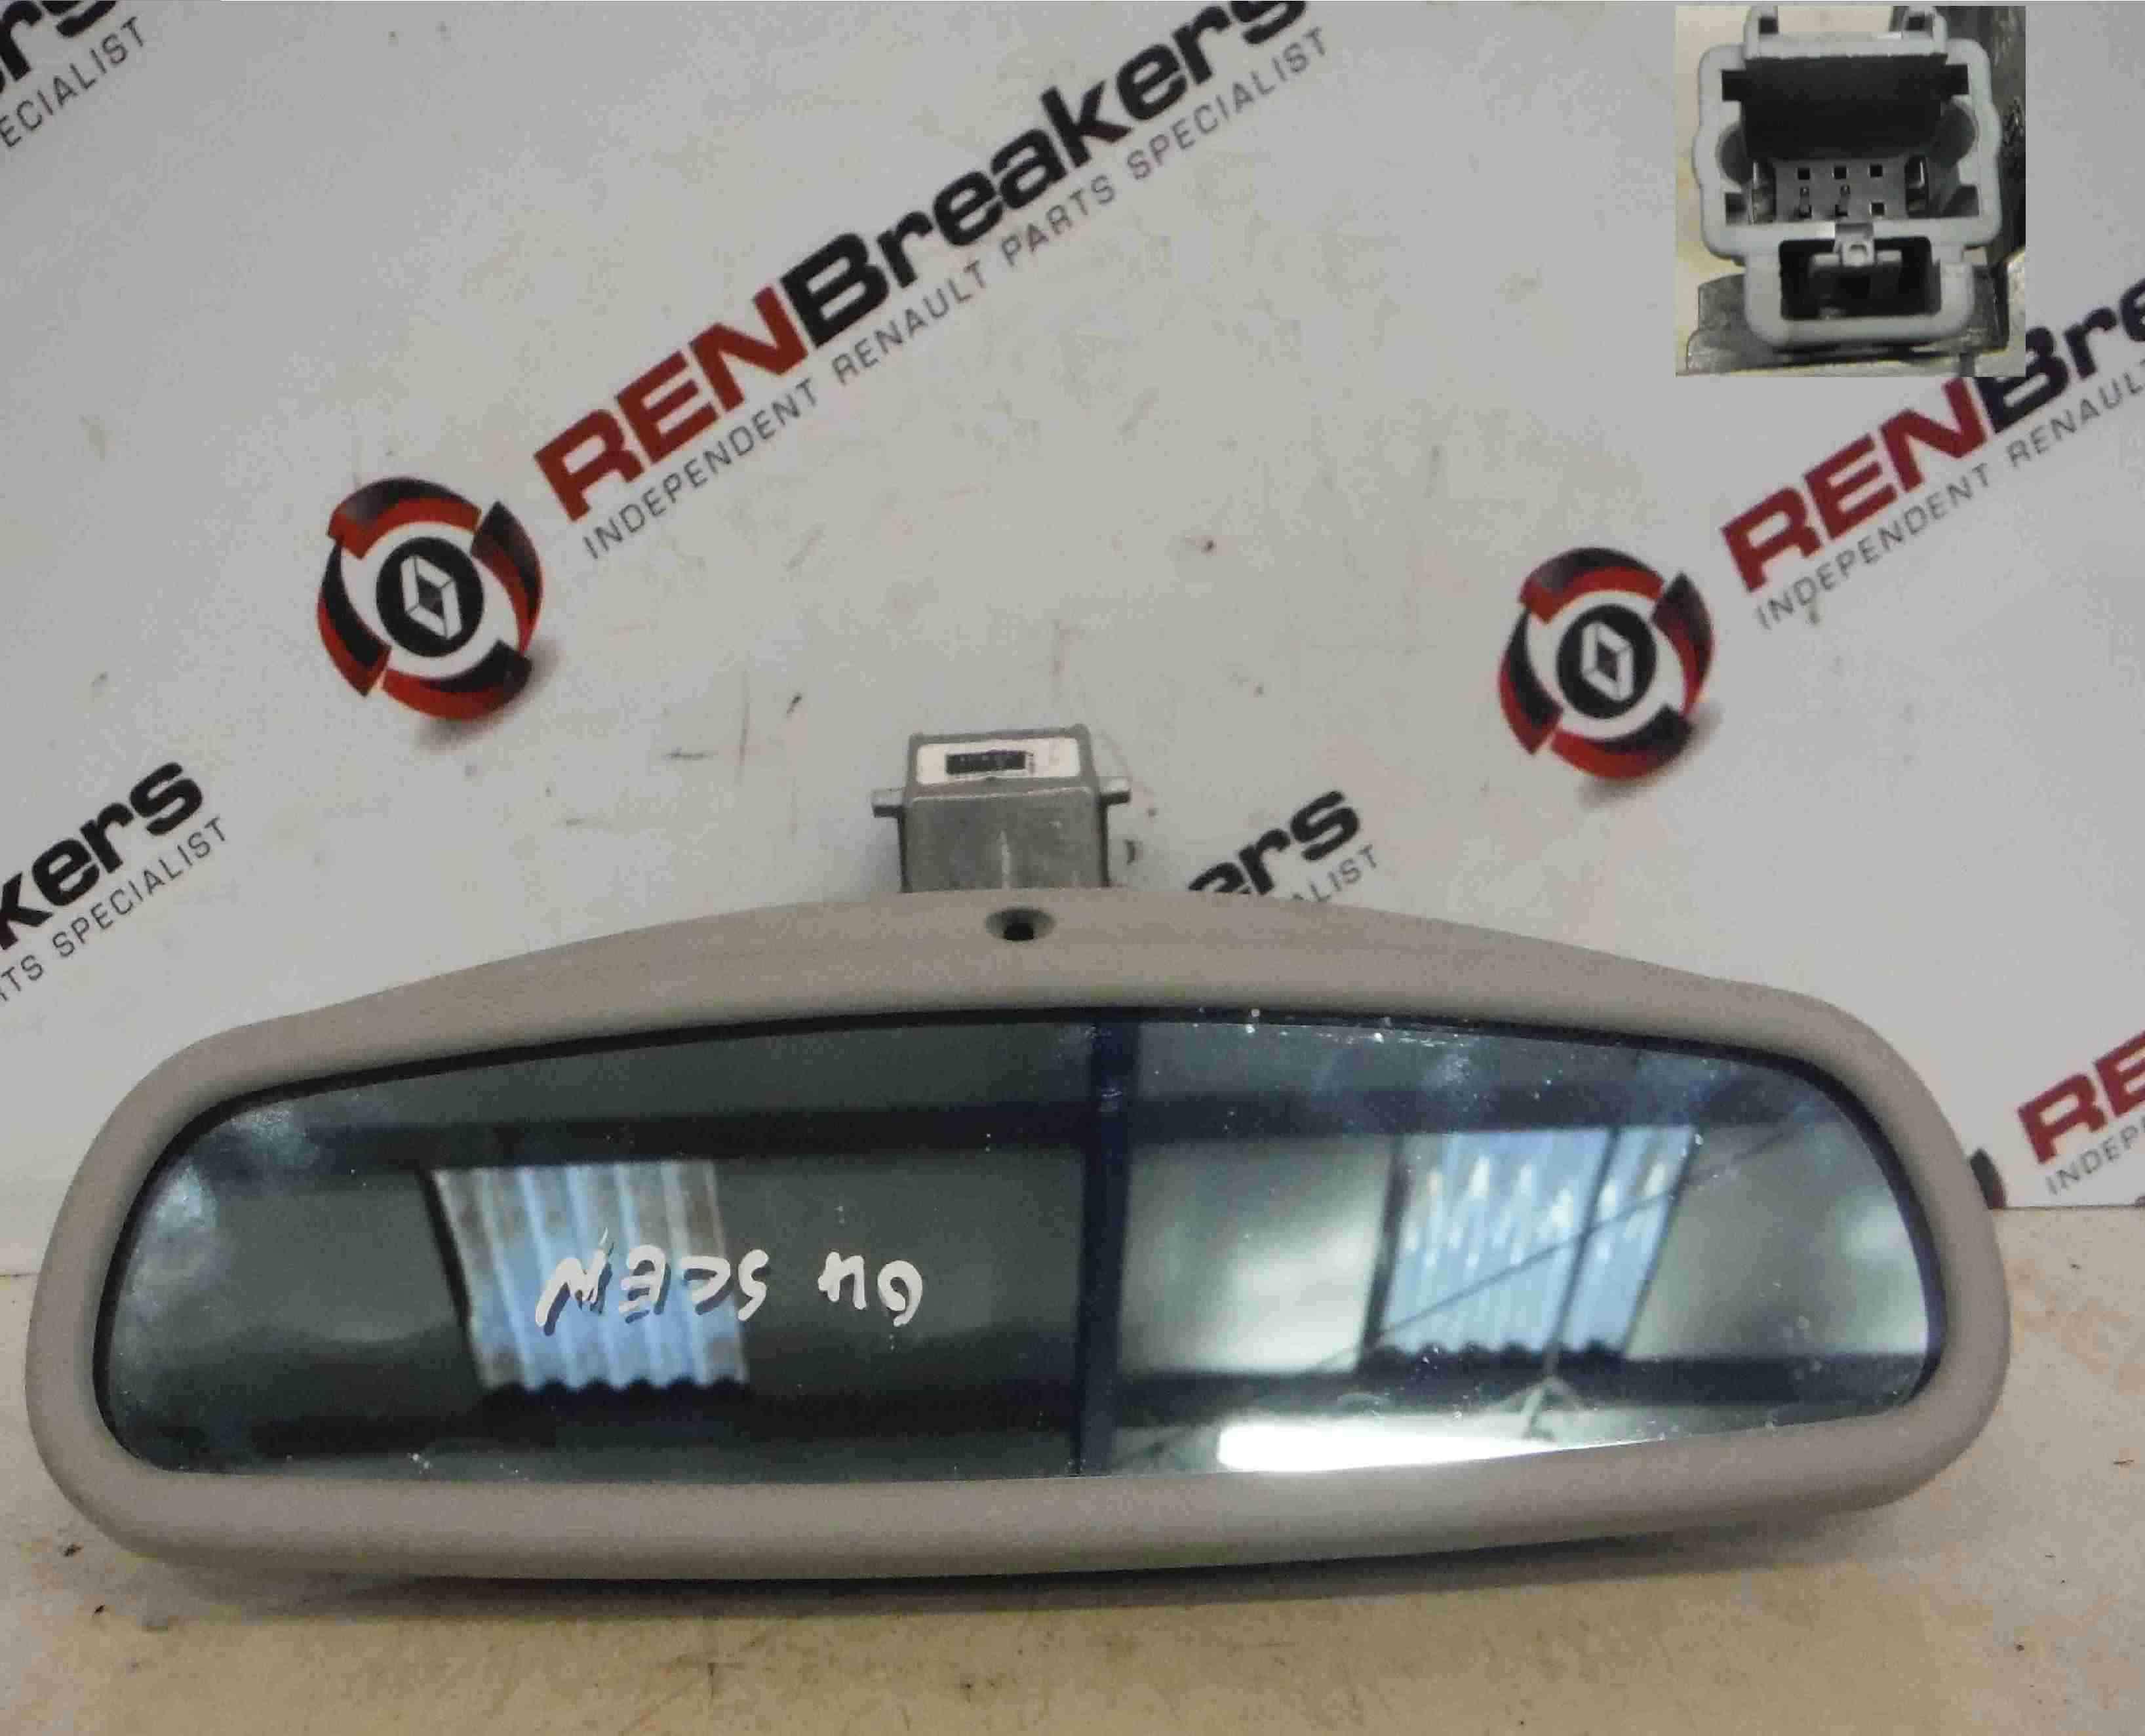 Renault Megane Scenic 2003-2009 Rear View Mirror Autodim 8200286924